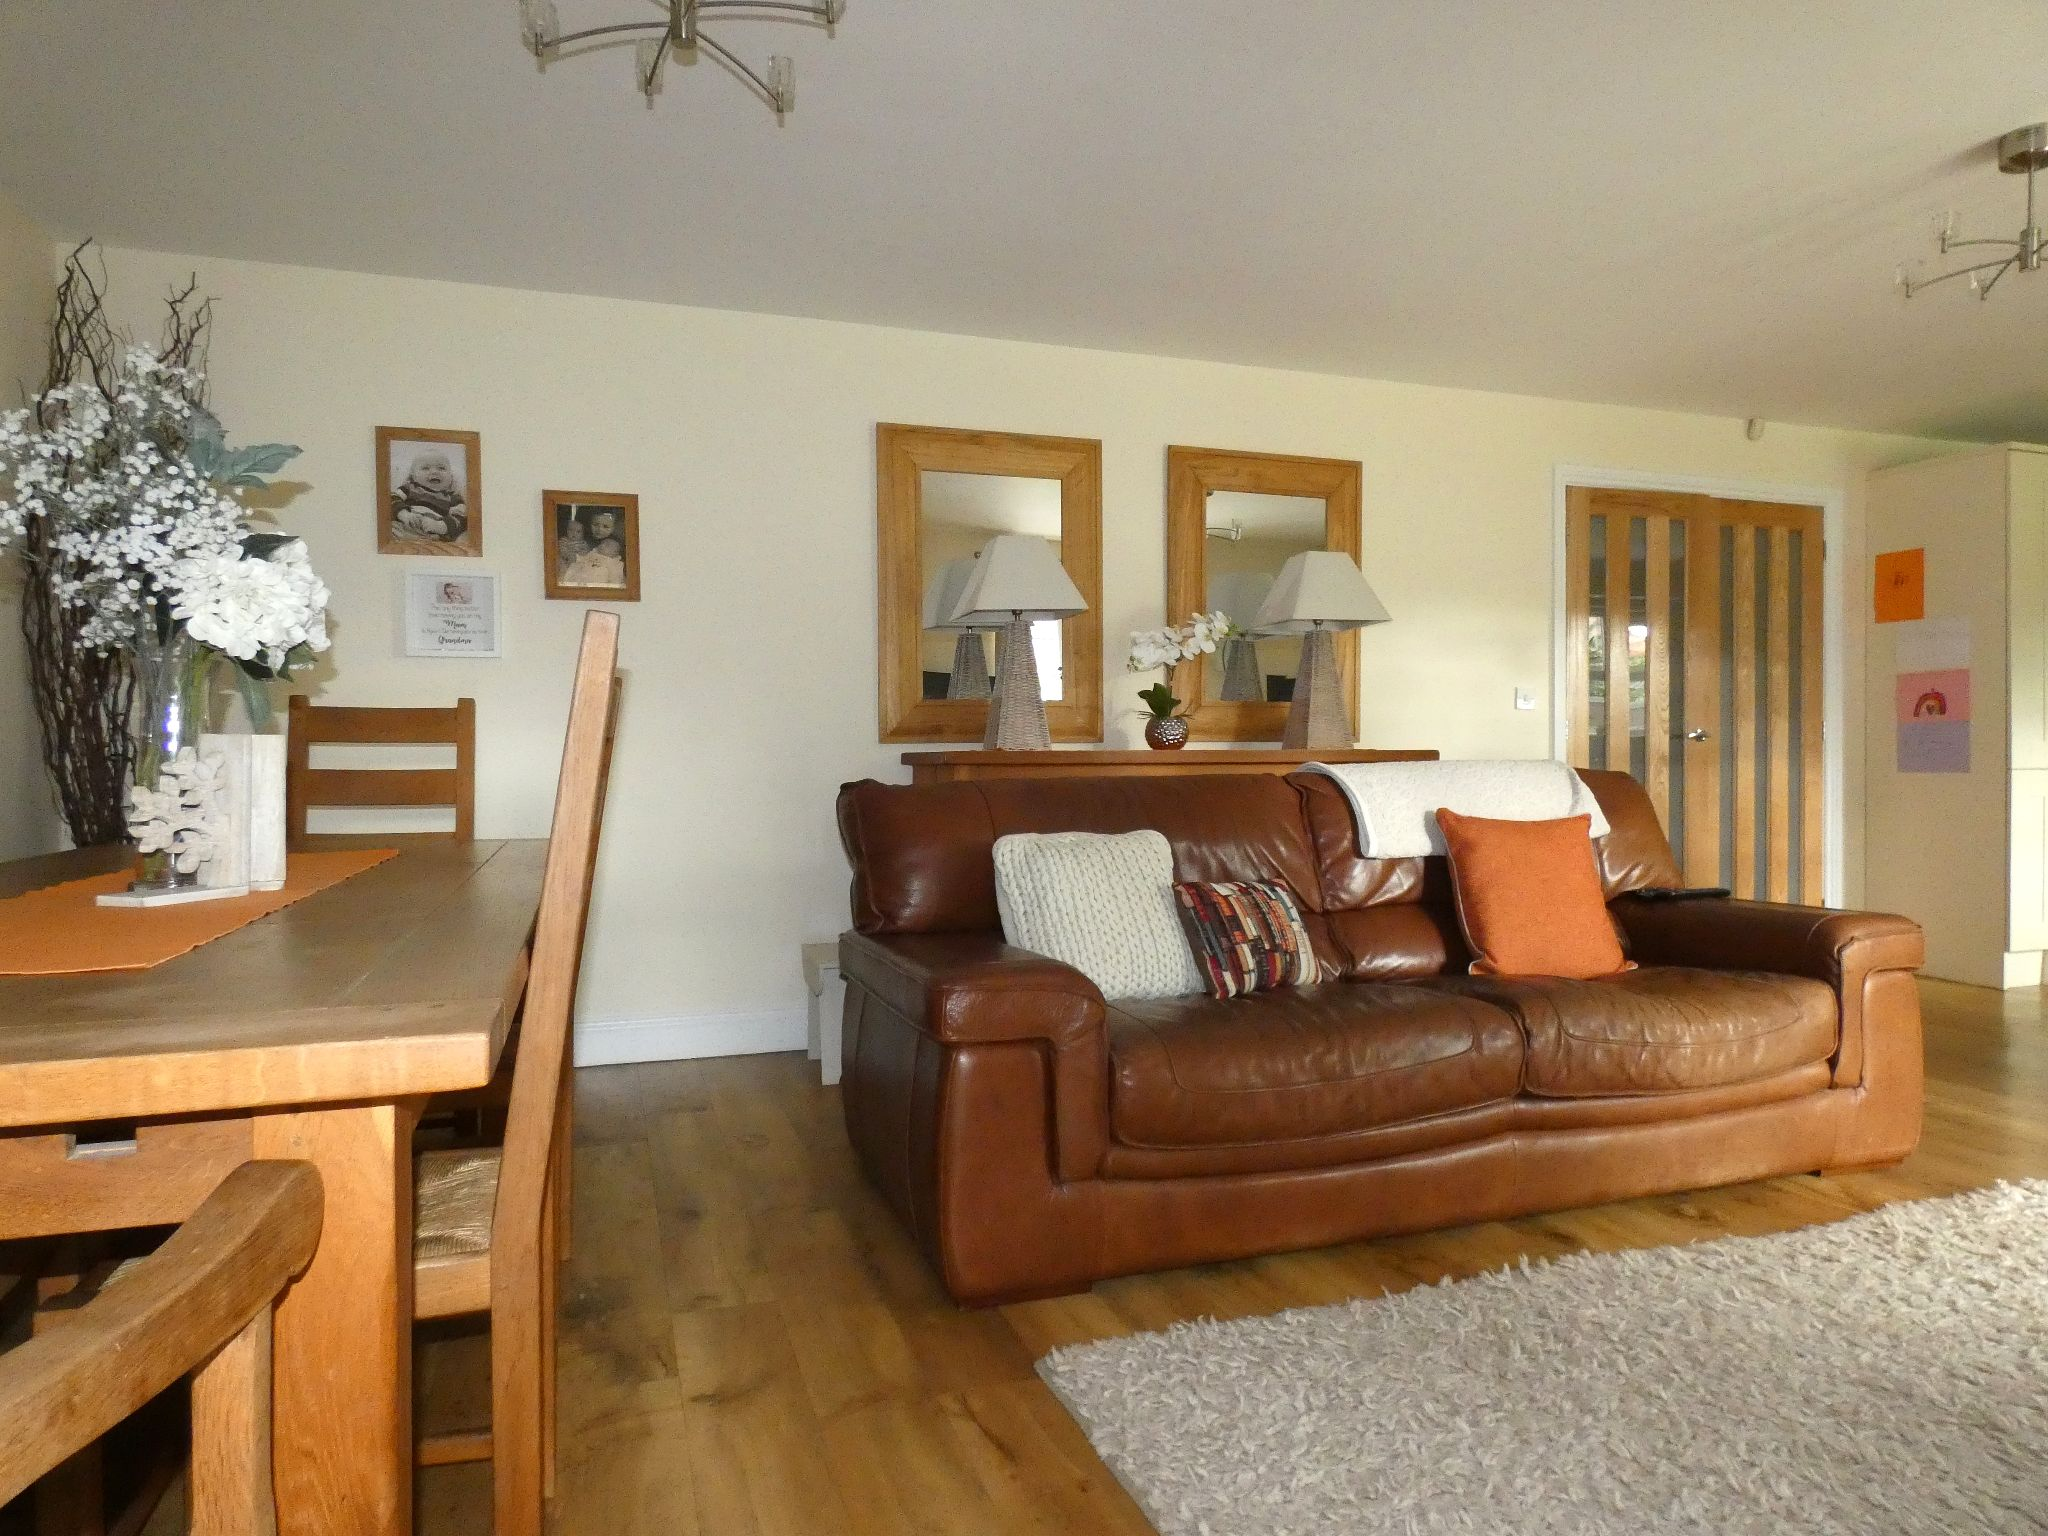 4 bedroom detached house For Sale in Bishop Auckland - Kitchen Diner/Family Room.